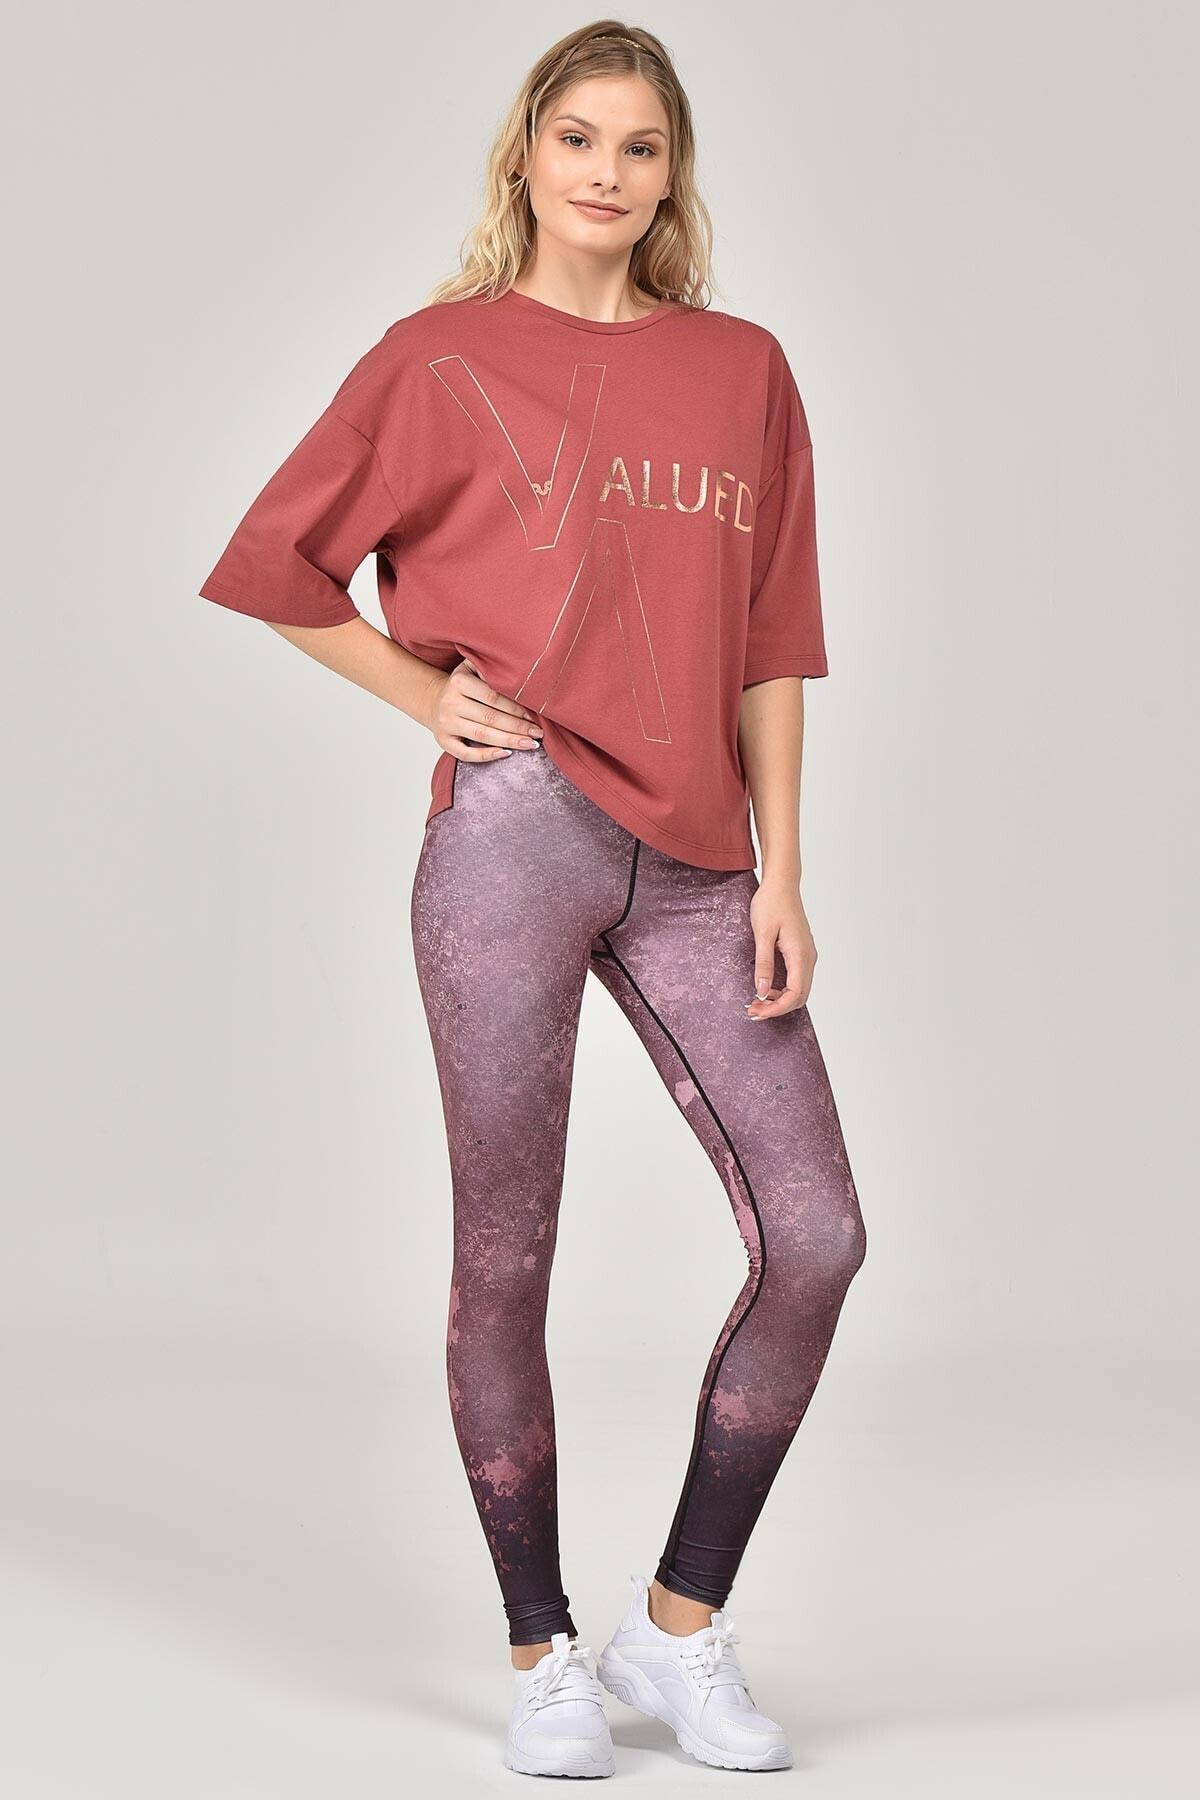 bilcee Kahverengi Kadın T-Shirt FW-1332 2